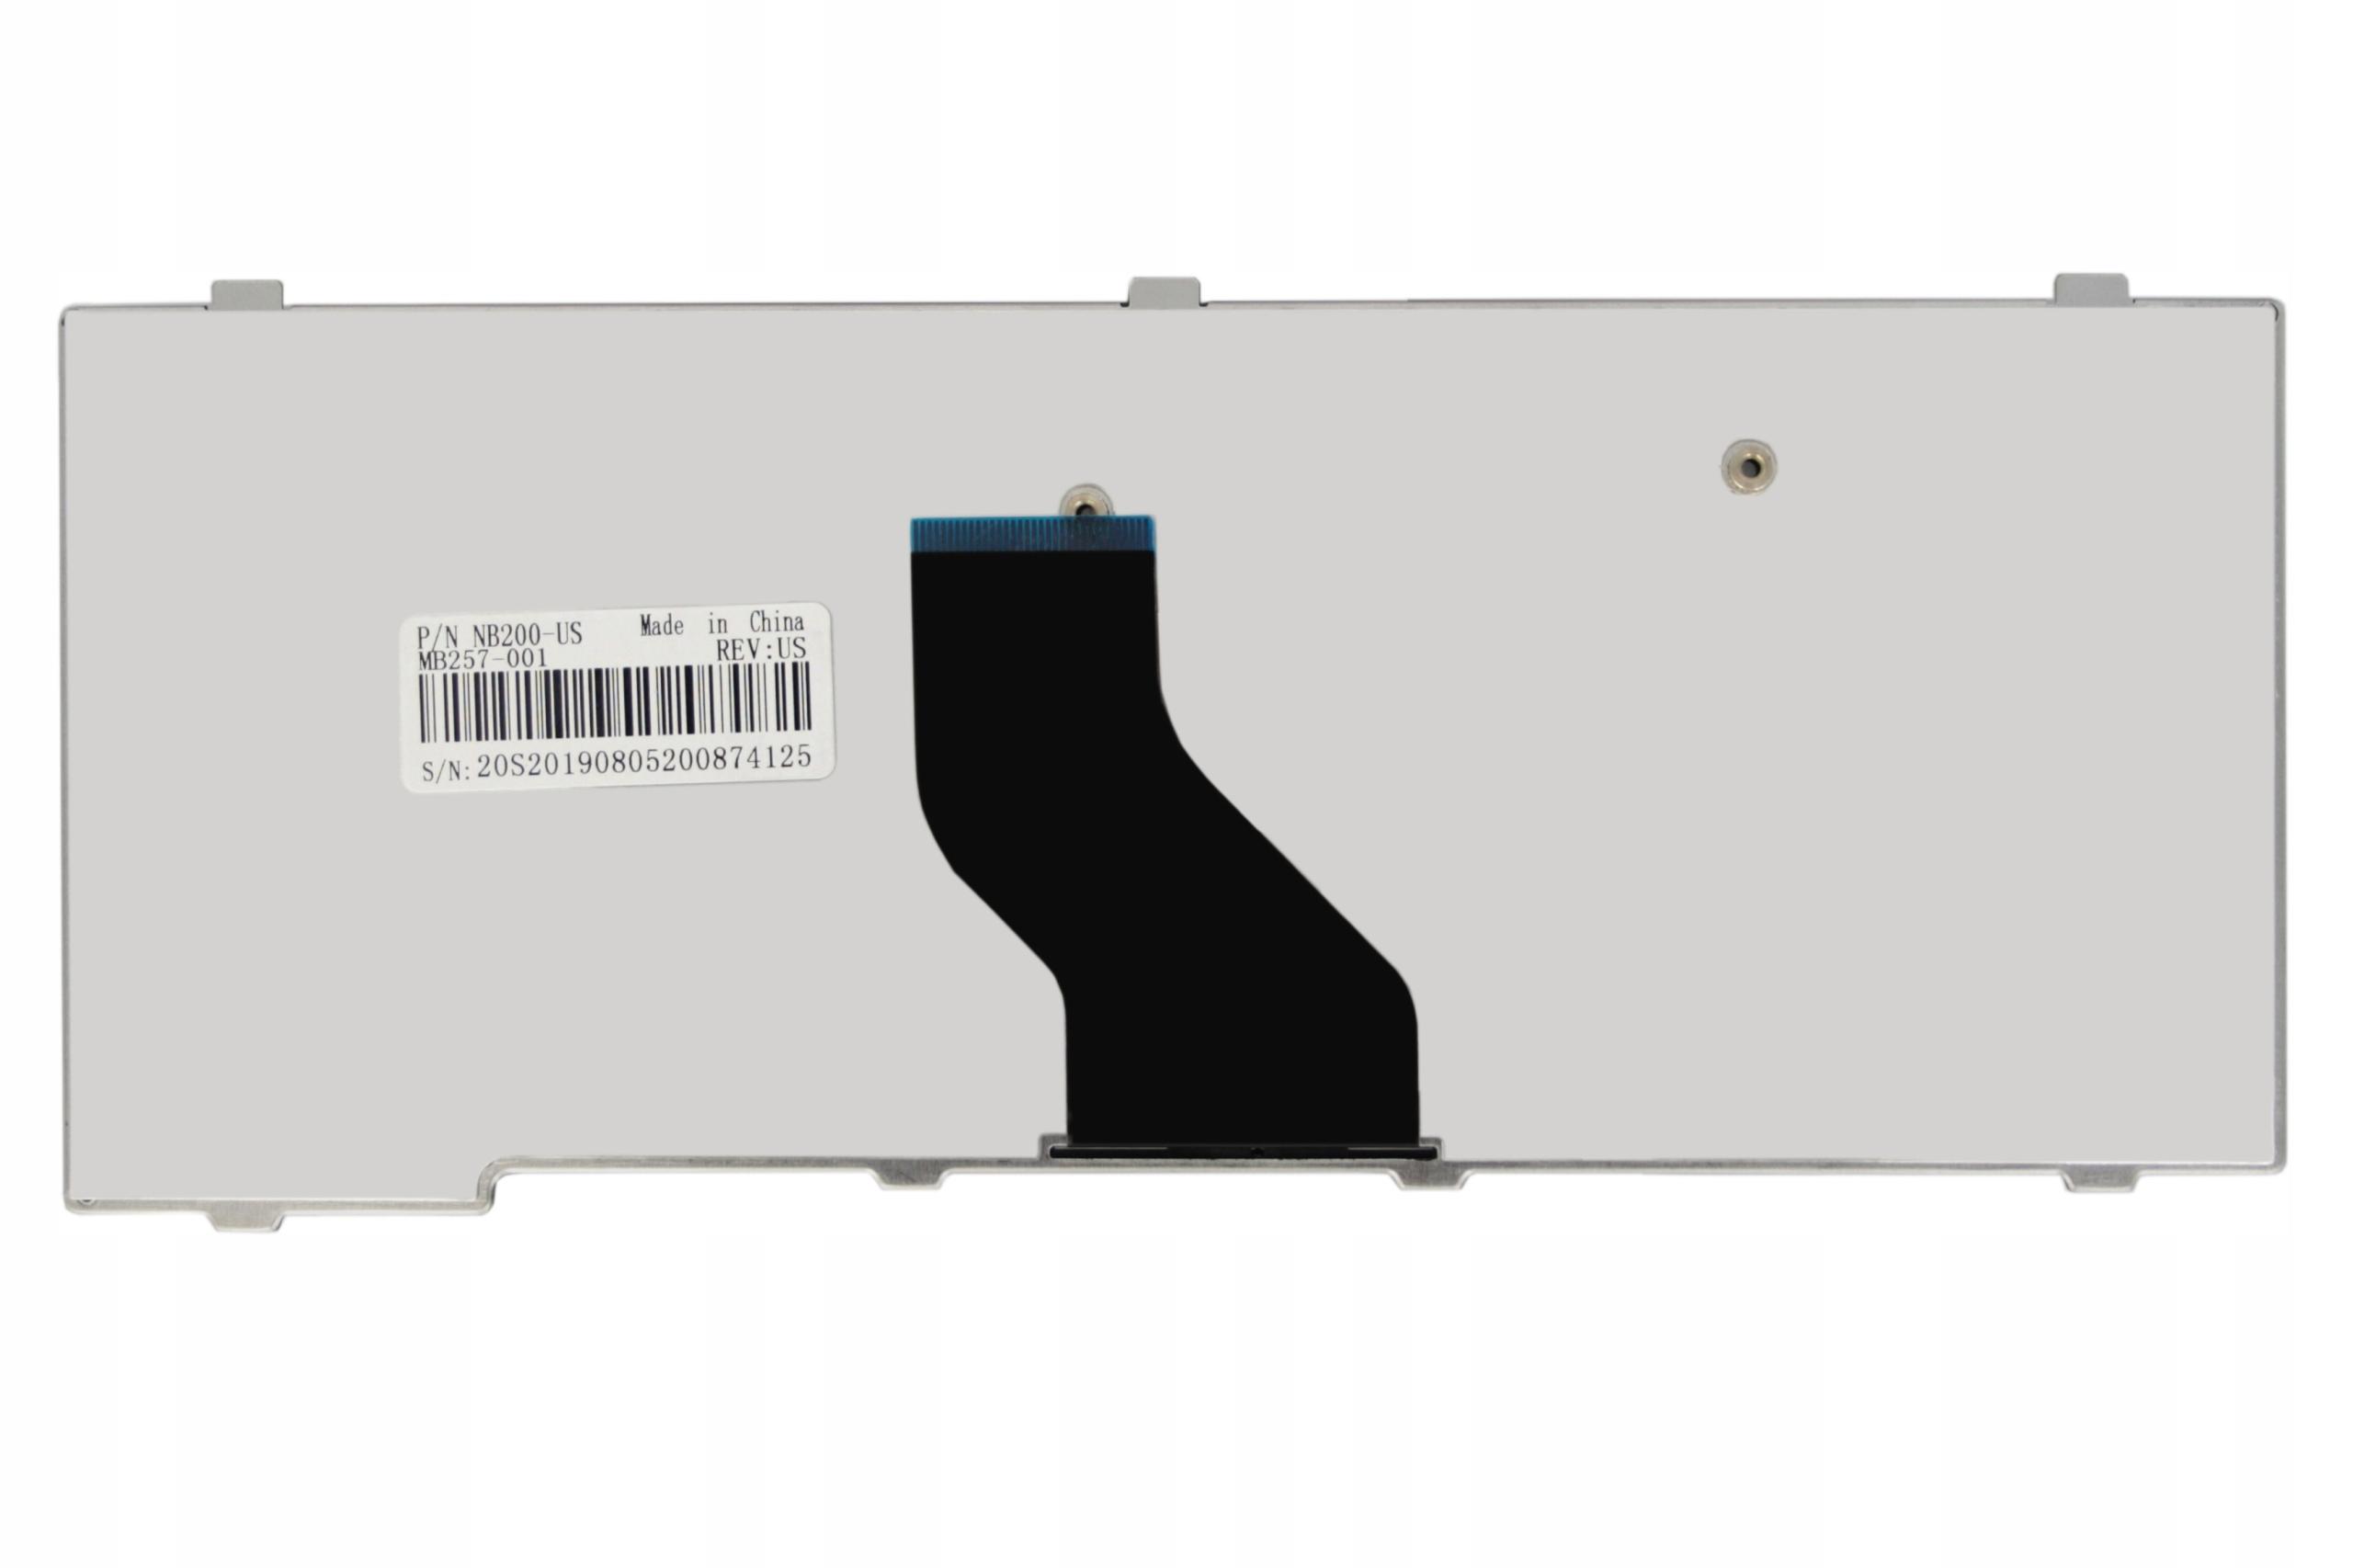 KLAWIATURA TOSHIBA NB250 NB550D NB200 NB305 - Klawiatury do laptopów